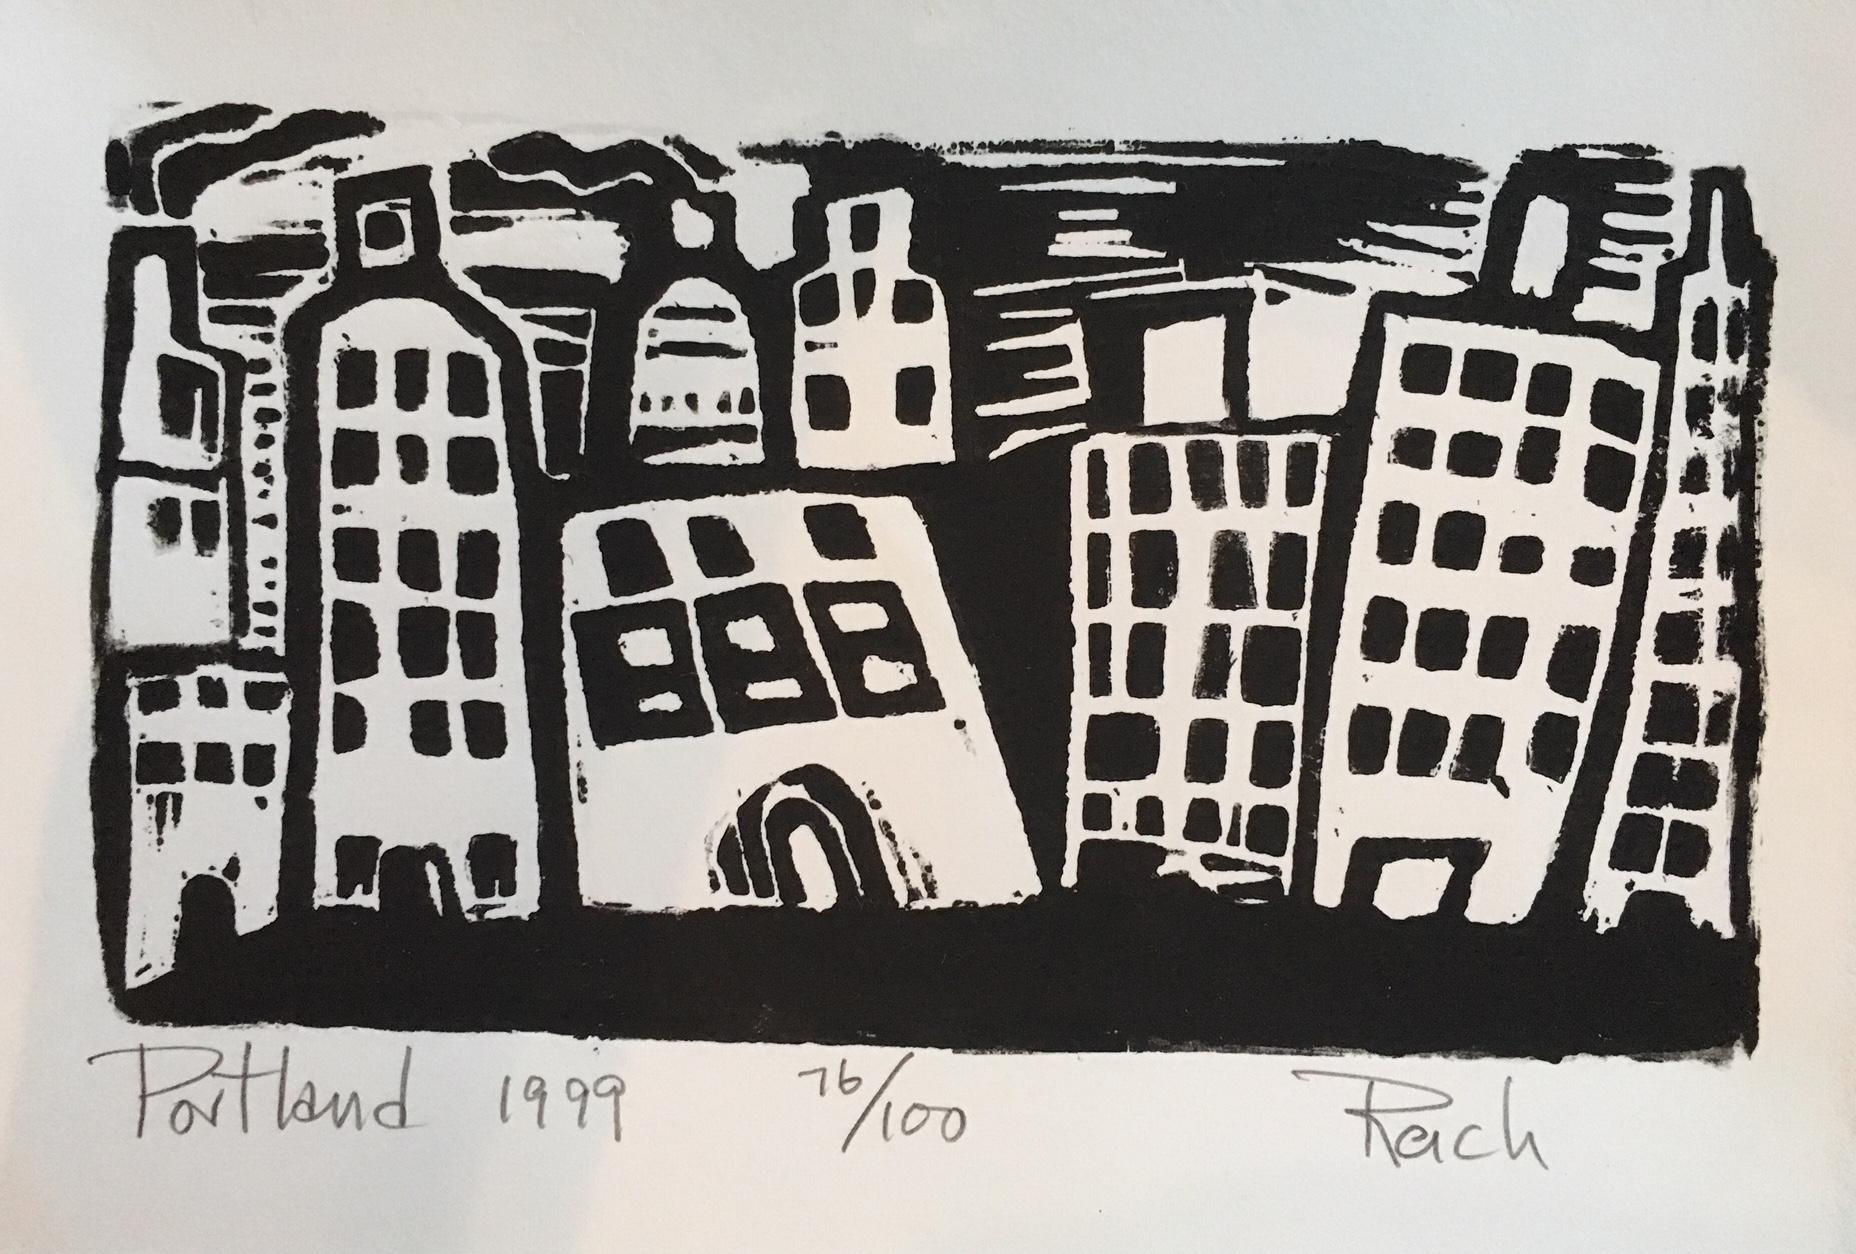 Dee Reich, Portland 1999, woodblock